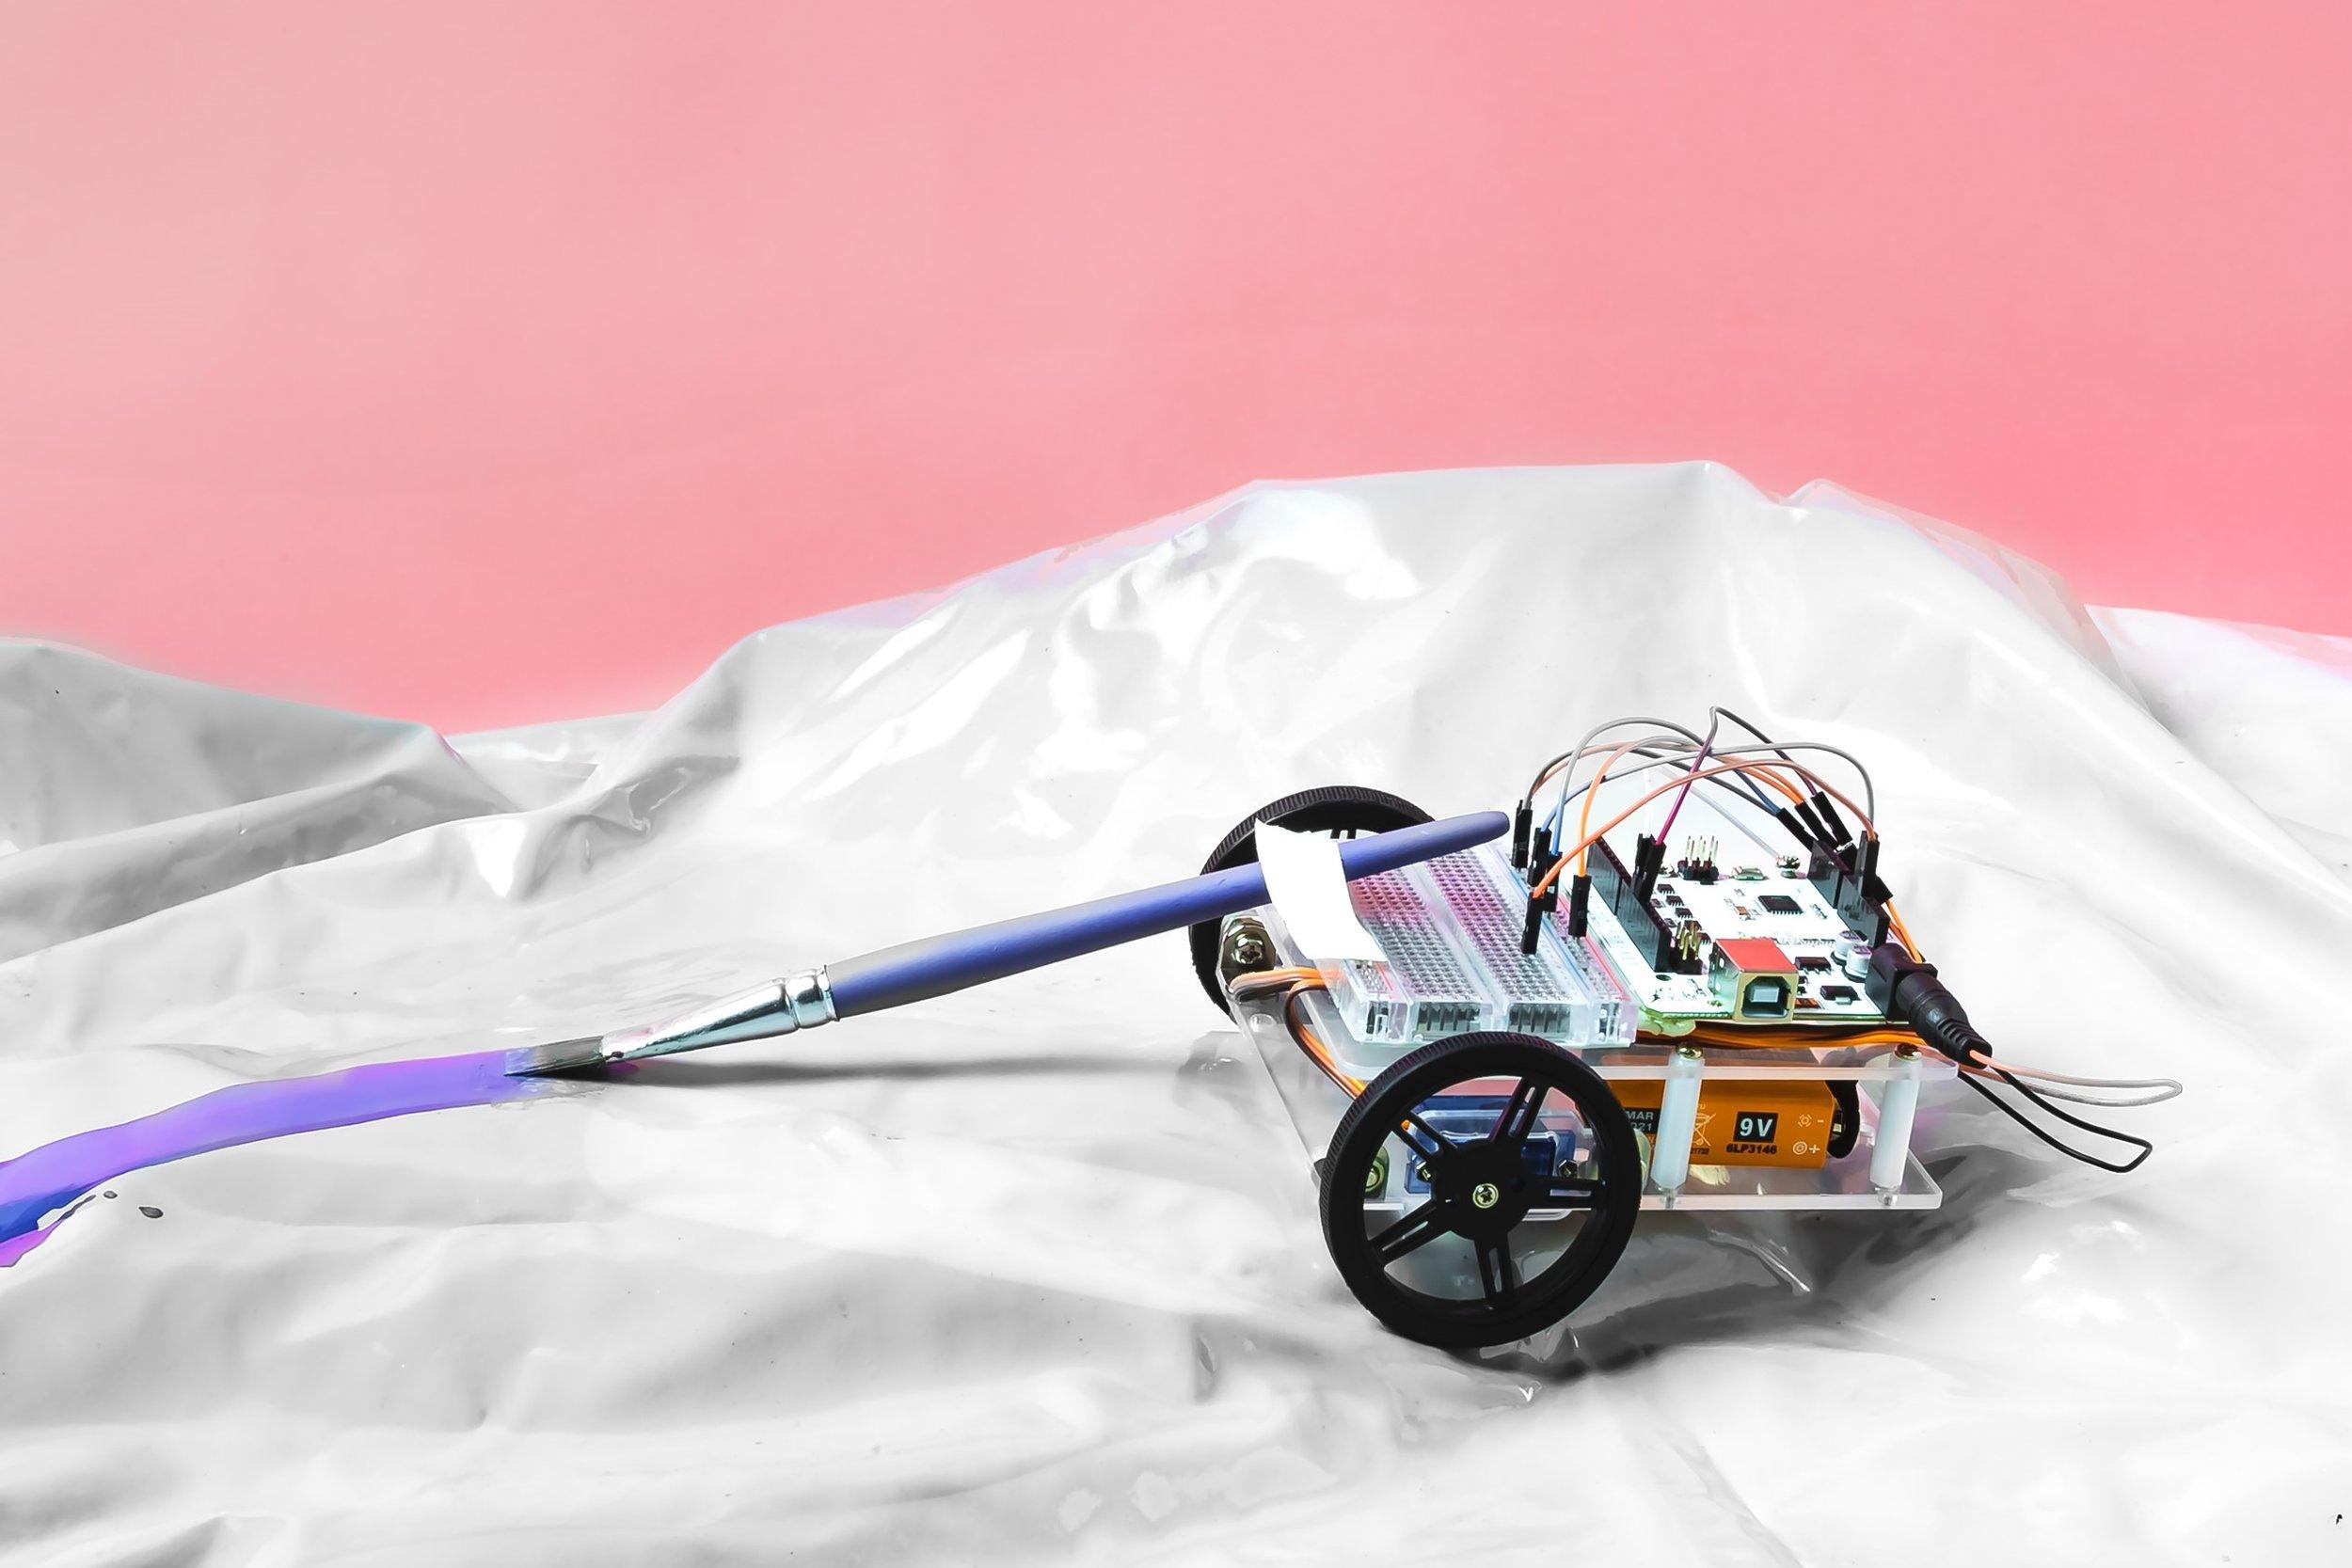 Maker_kit_moving_vehicle.jpg